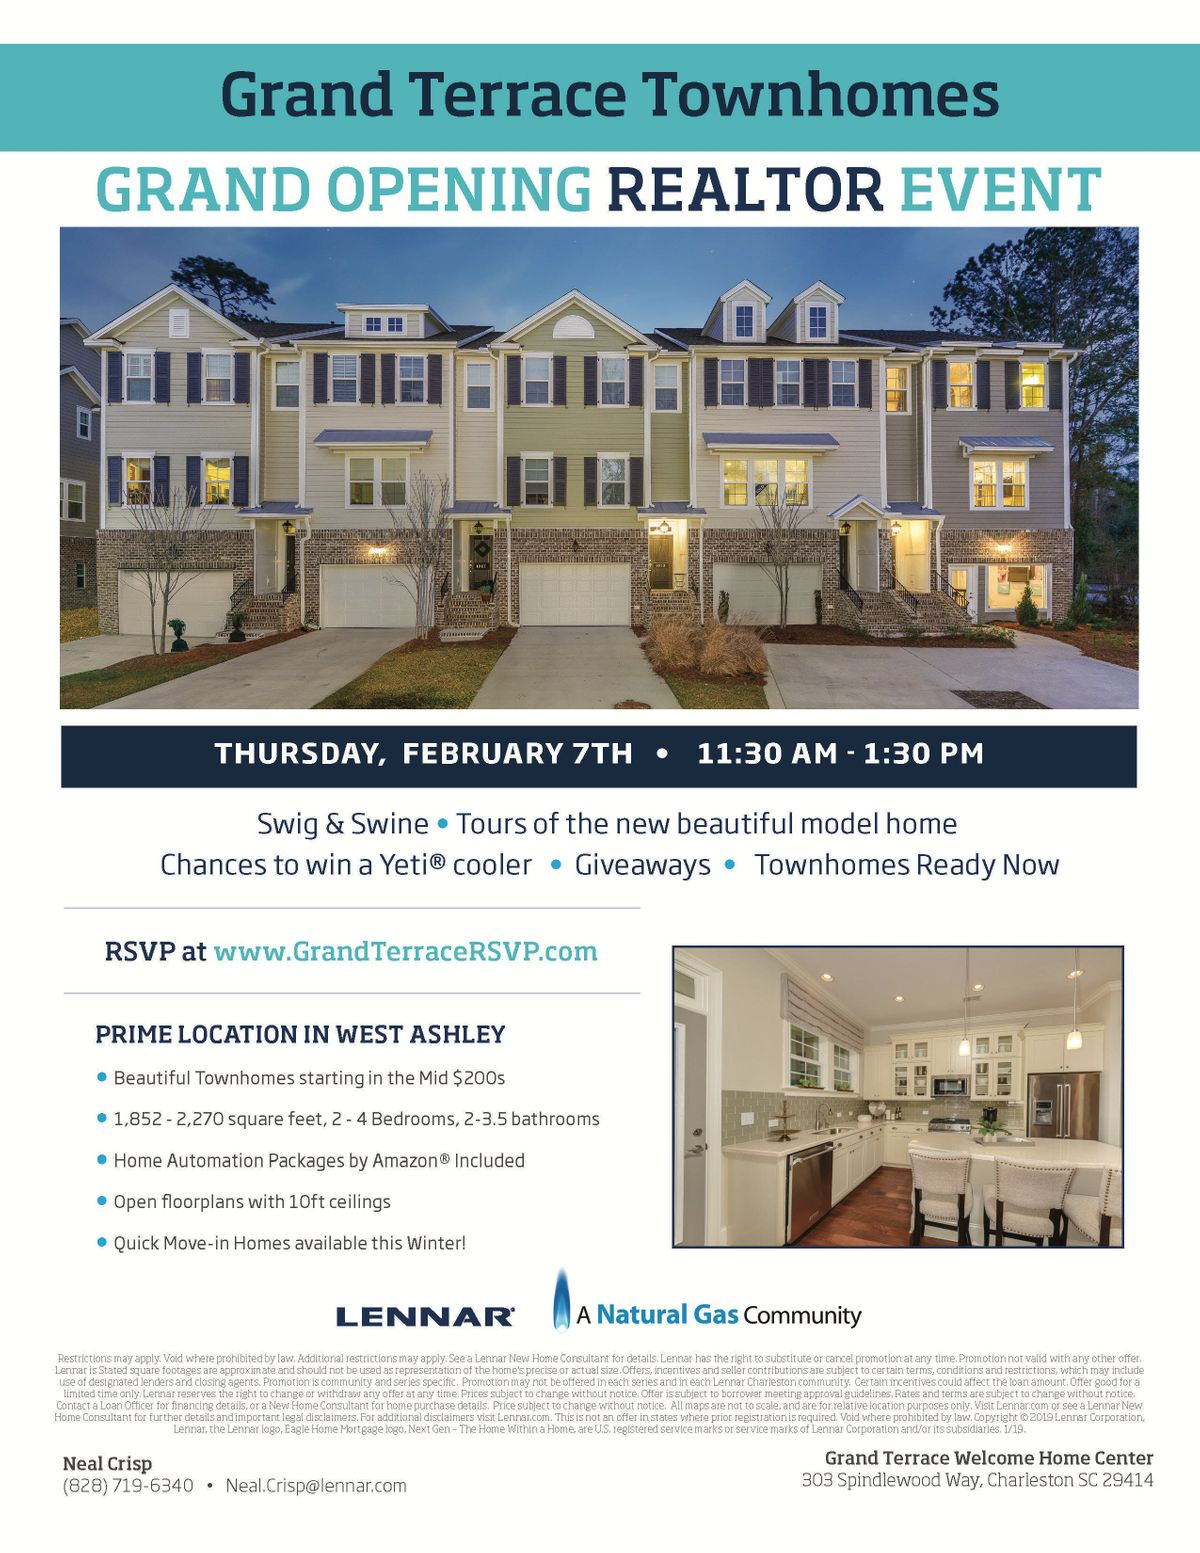 Grand Terrace Realtor VIP Grand Opening Event